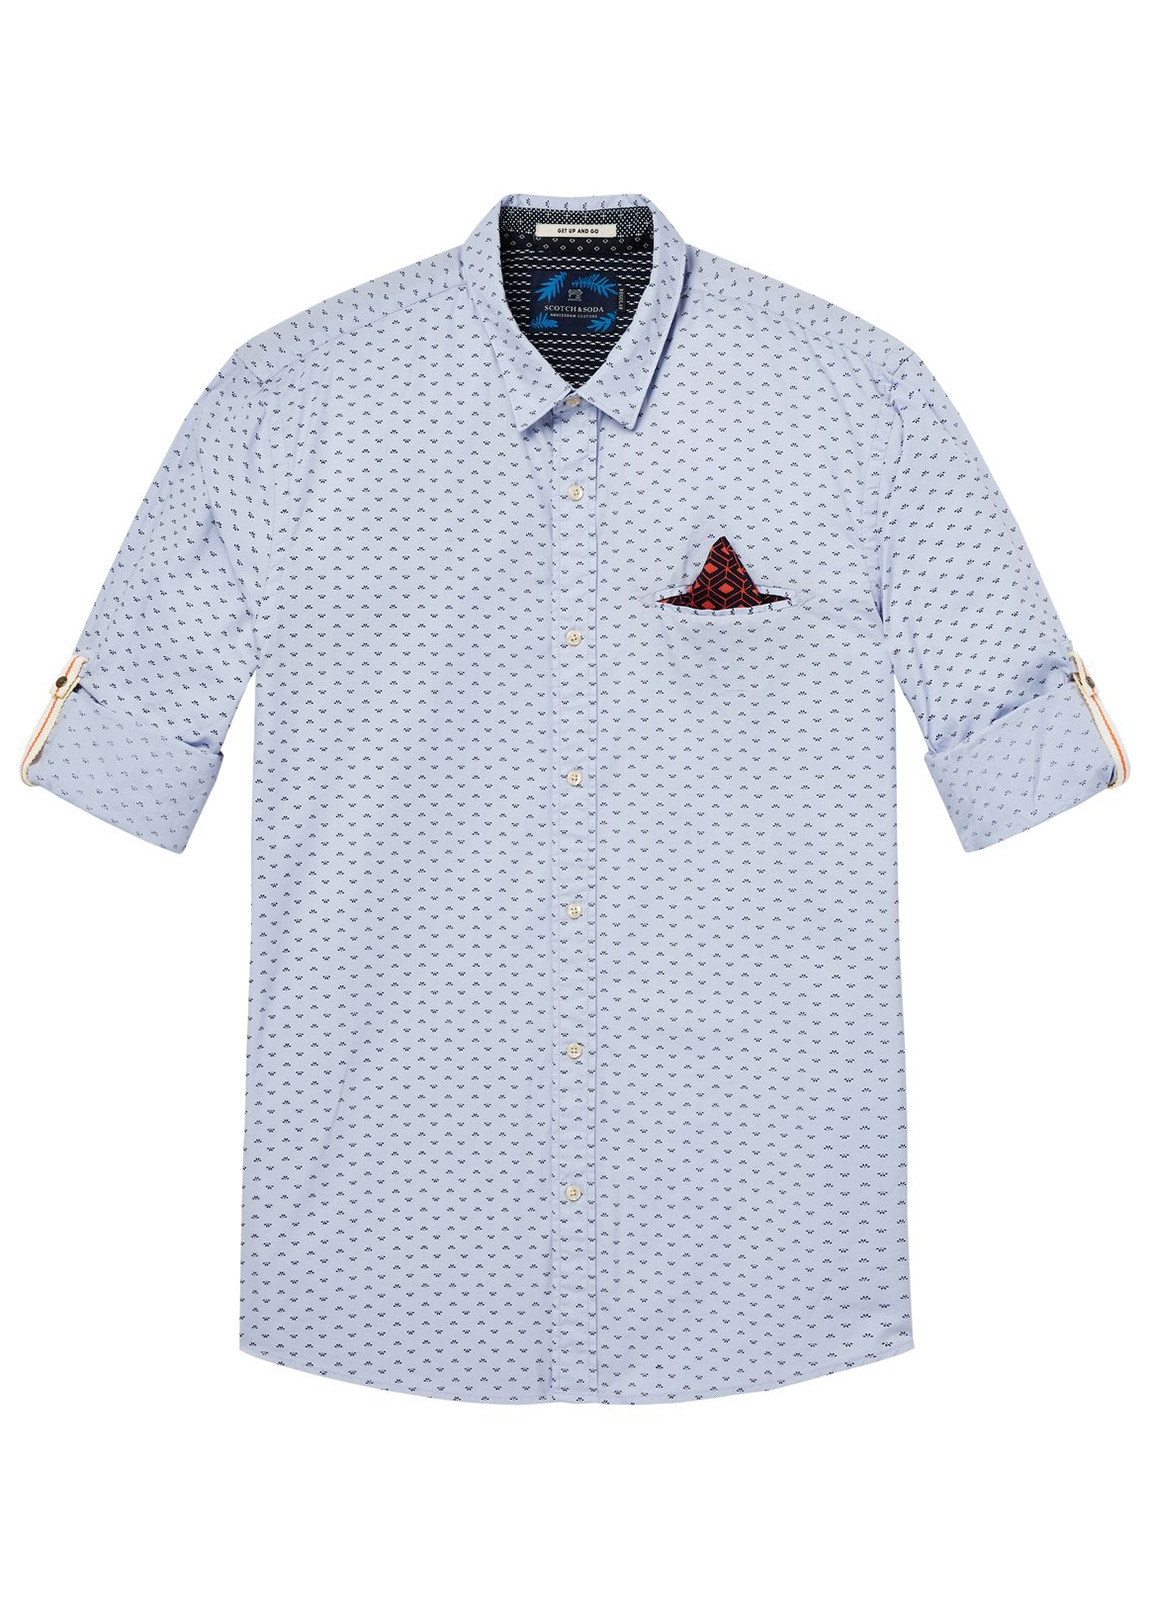 Camisa REGULAR FIT, cuello clasico de dibujo color azul celeste. Pañuelo de bolsillo fijo y presillas en mangas.100% Algodón. - Ítem4